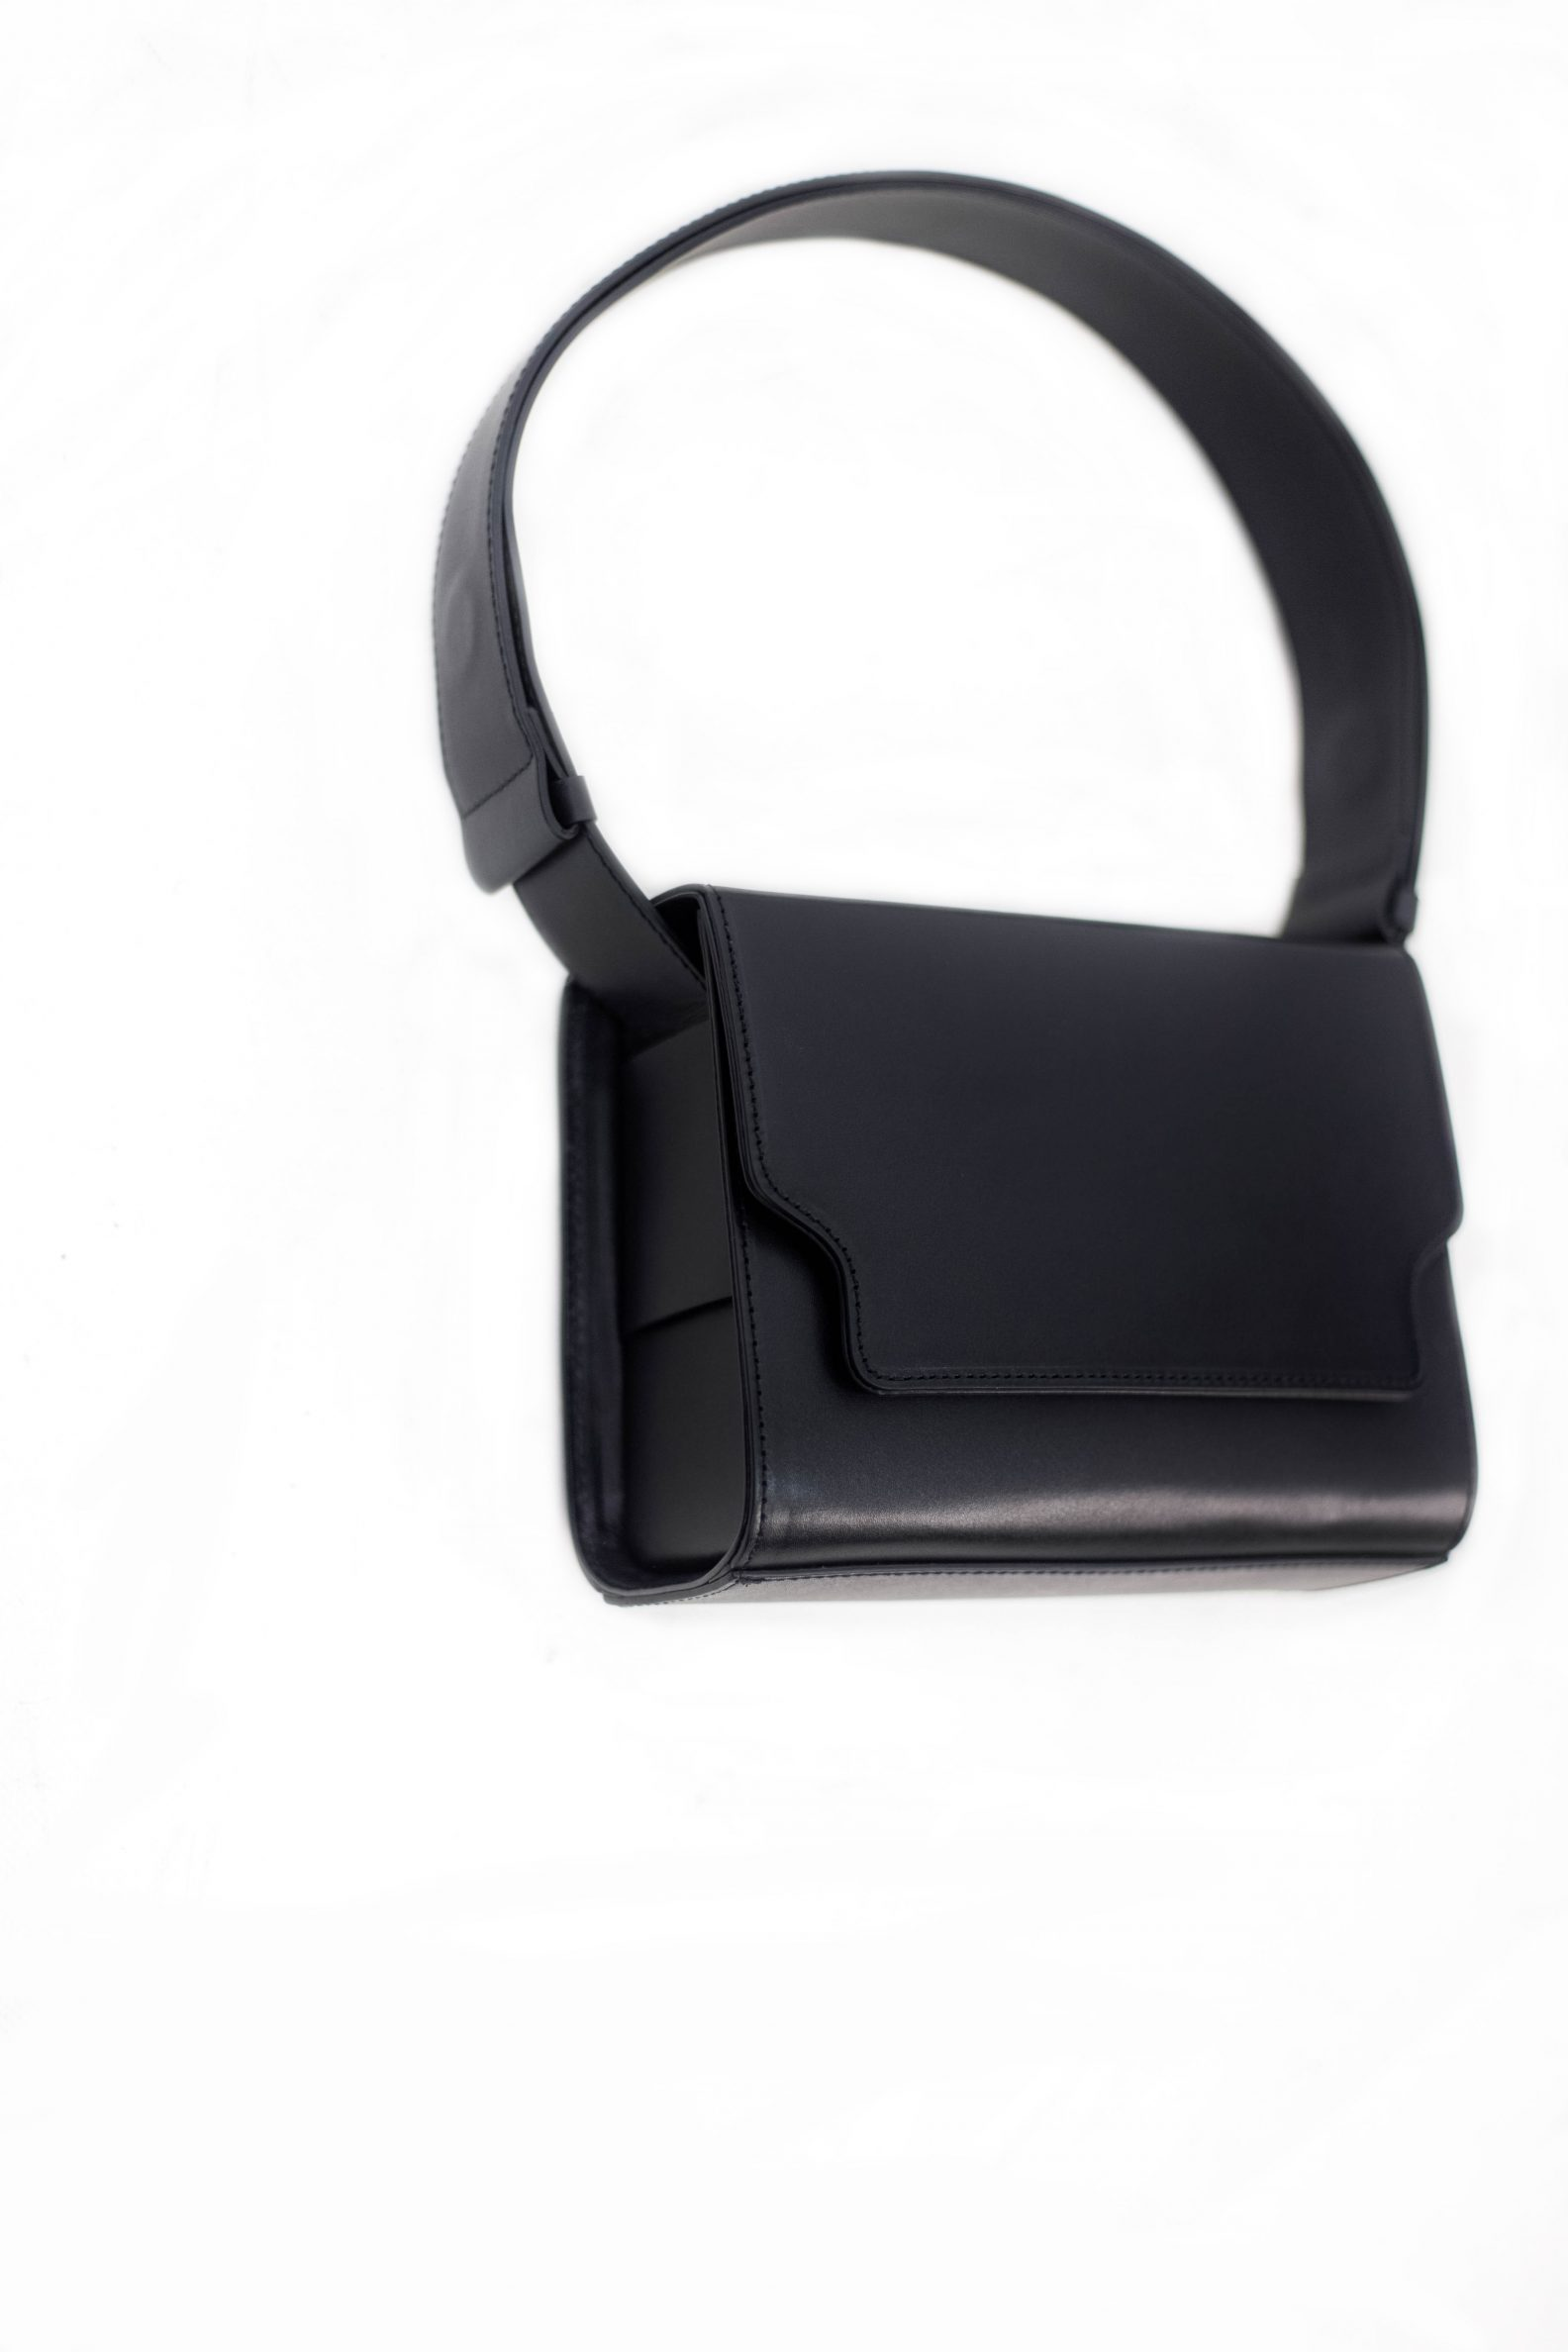 2-sac-cuir-rabat-noir-affaires-etrangeres-paris-mode-coreenne-besides-kimchi-jpg;